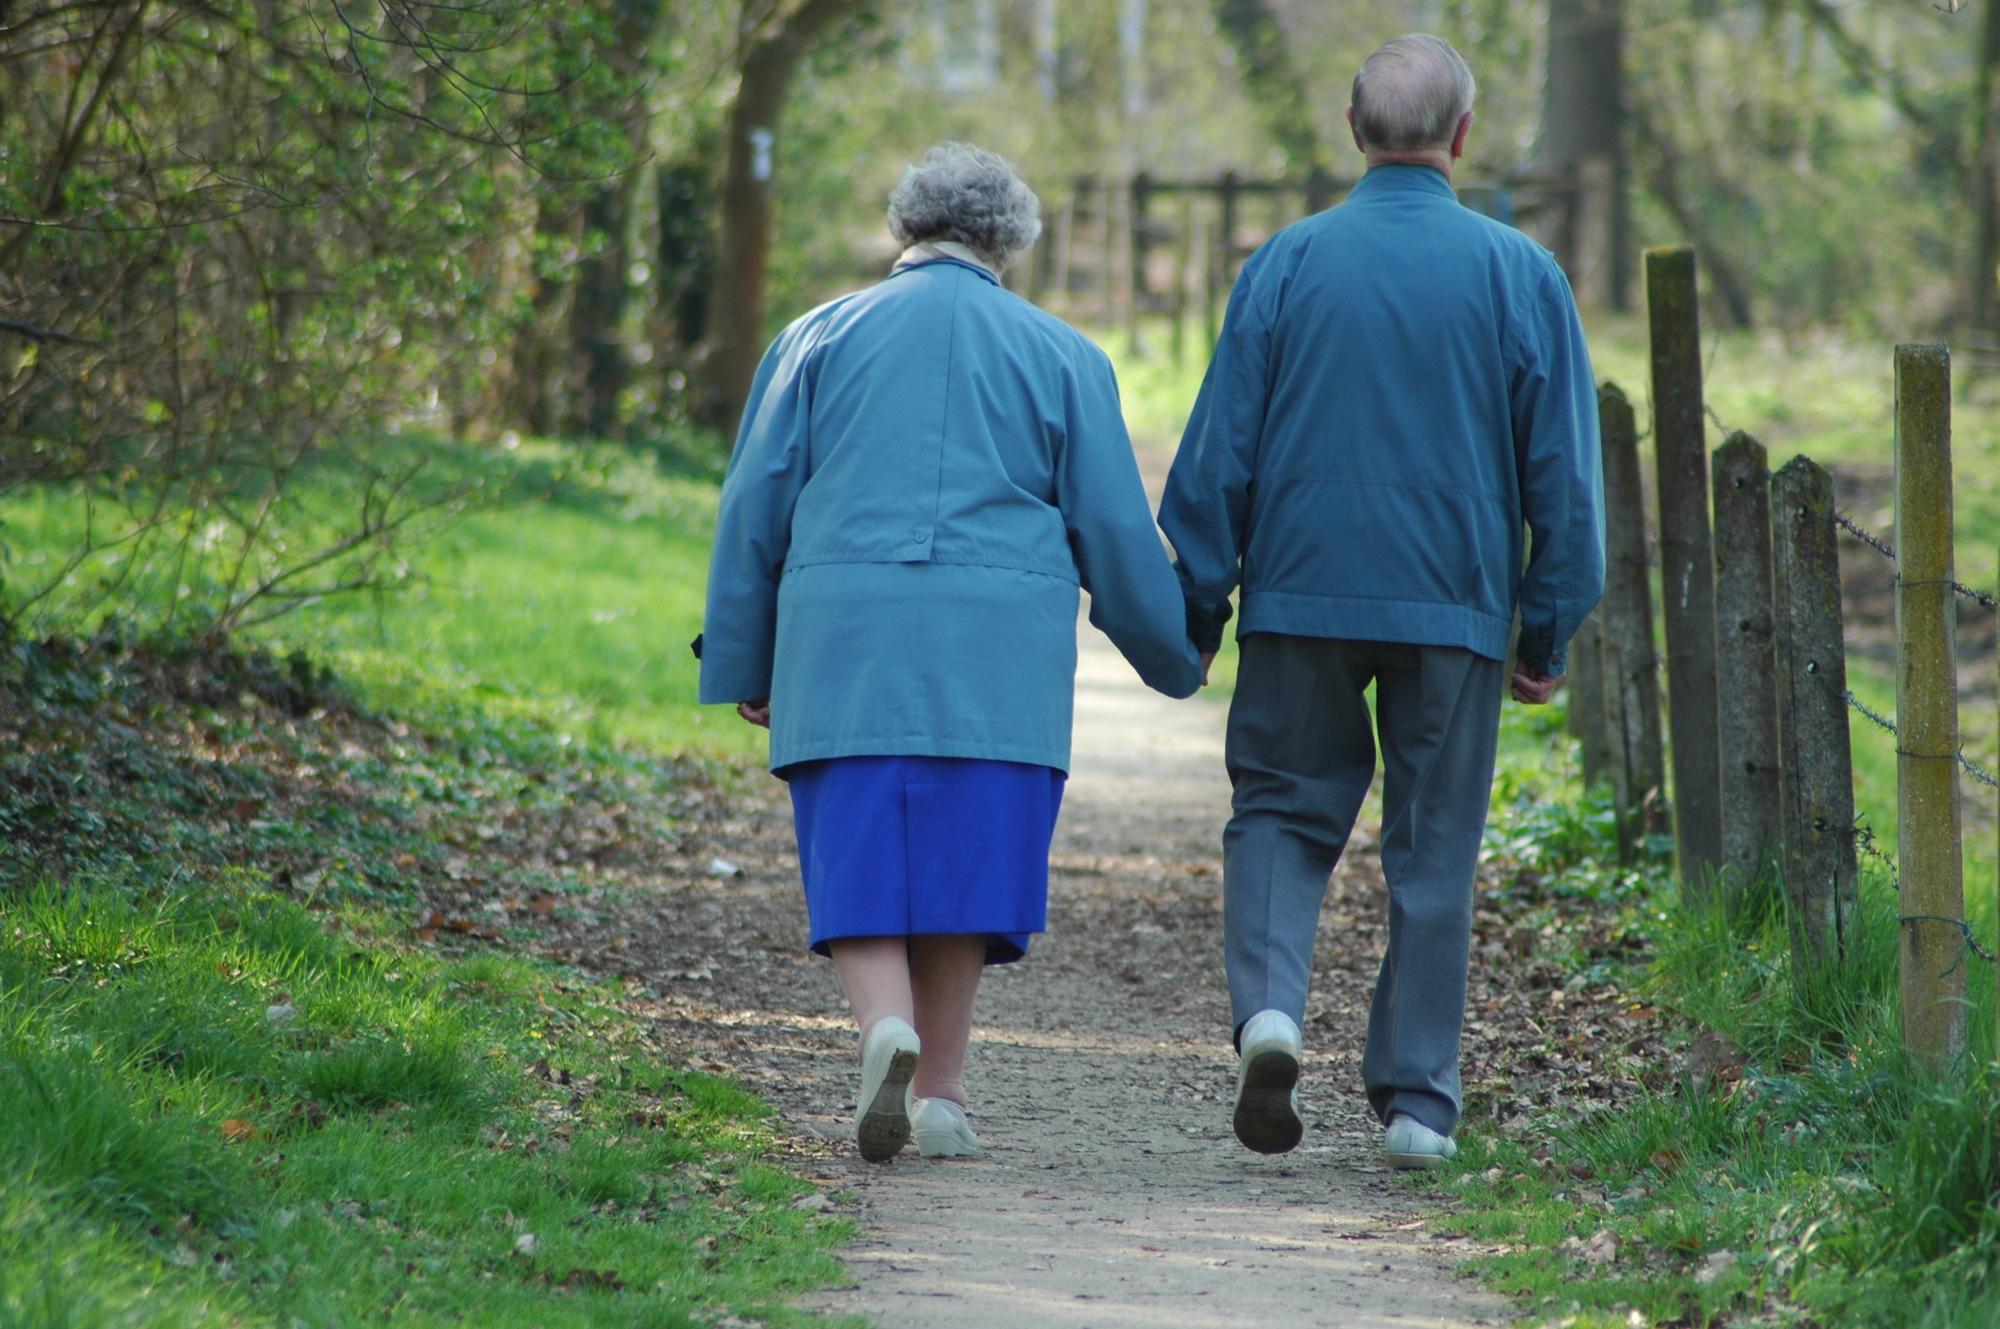 ¿Qué podemos hacer desde casa para ayudar al enfermo con Alzheimer?